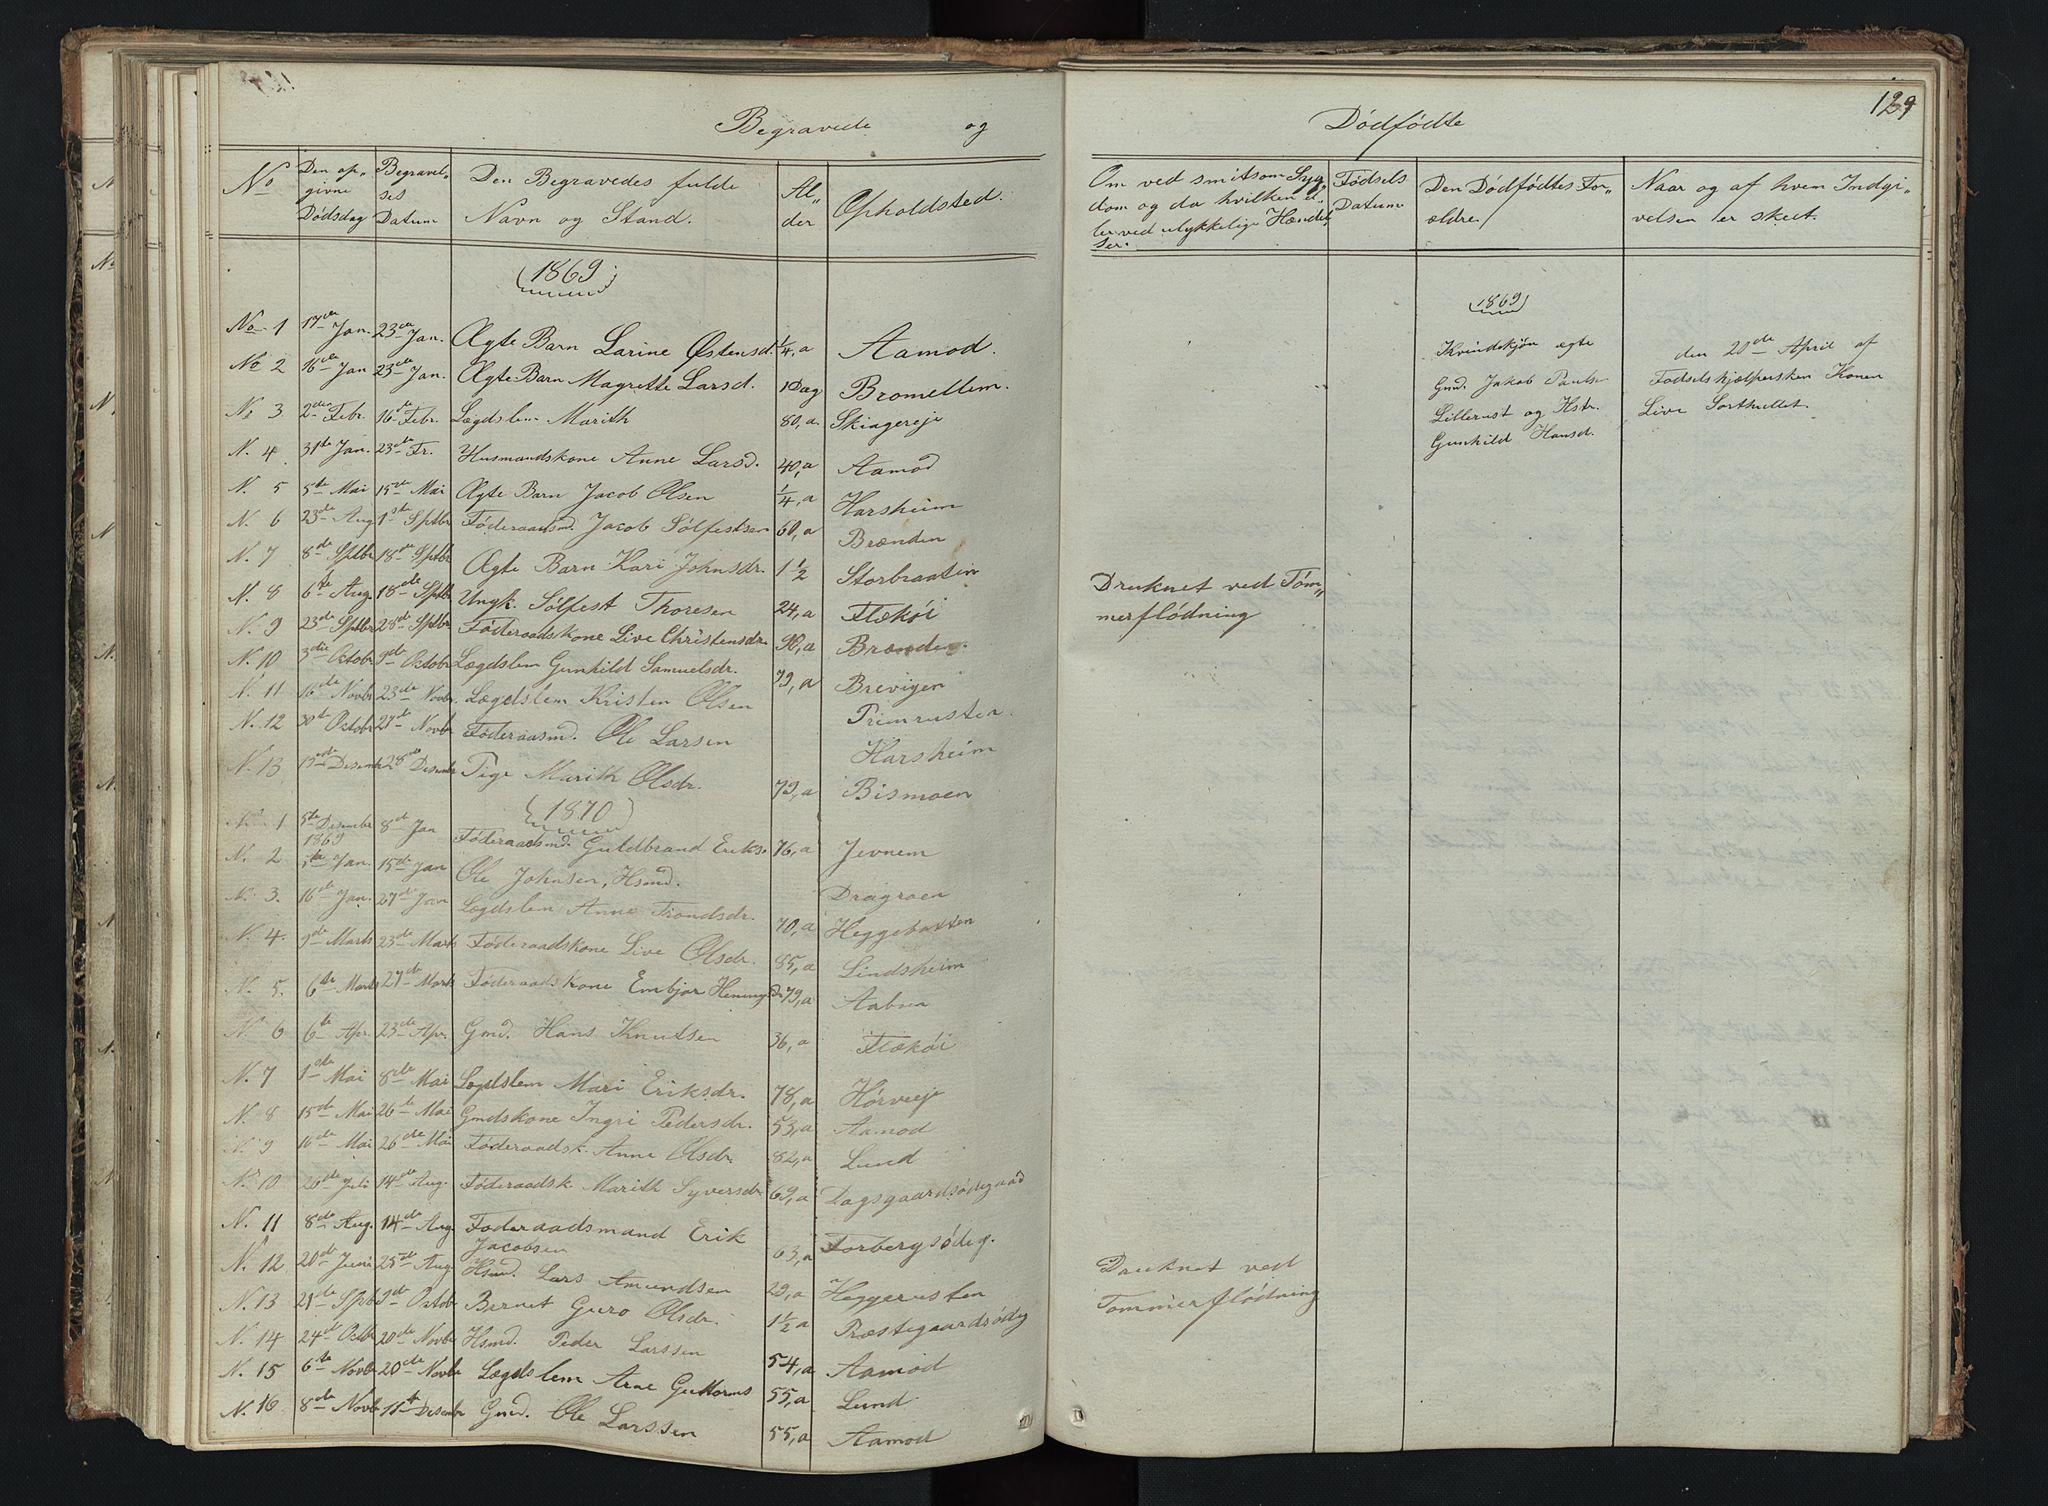 SAH, Skjåk prestekontor, Klokkerbok nr. 2, 1867-1894, s. 129